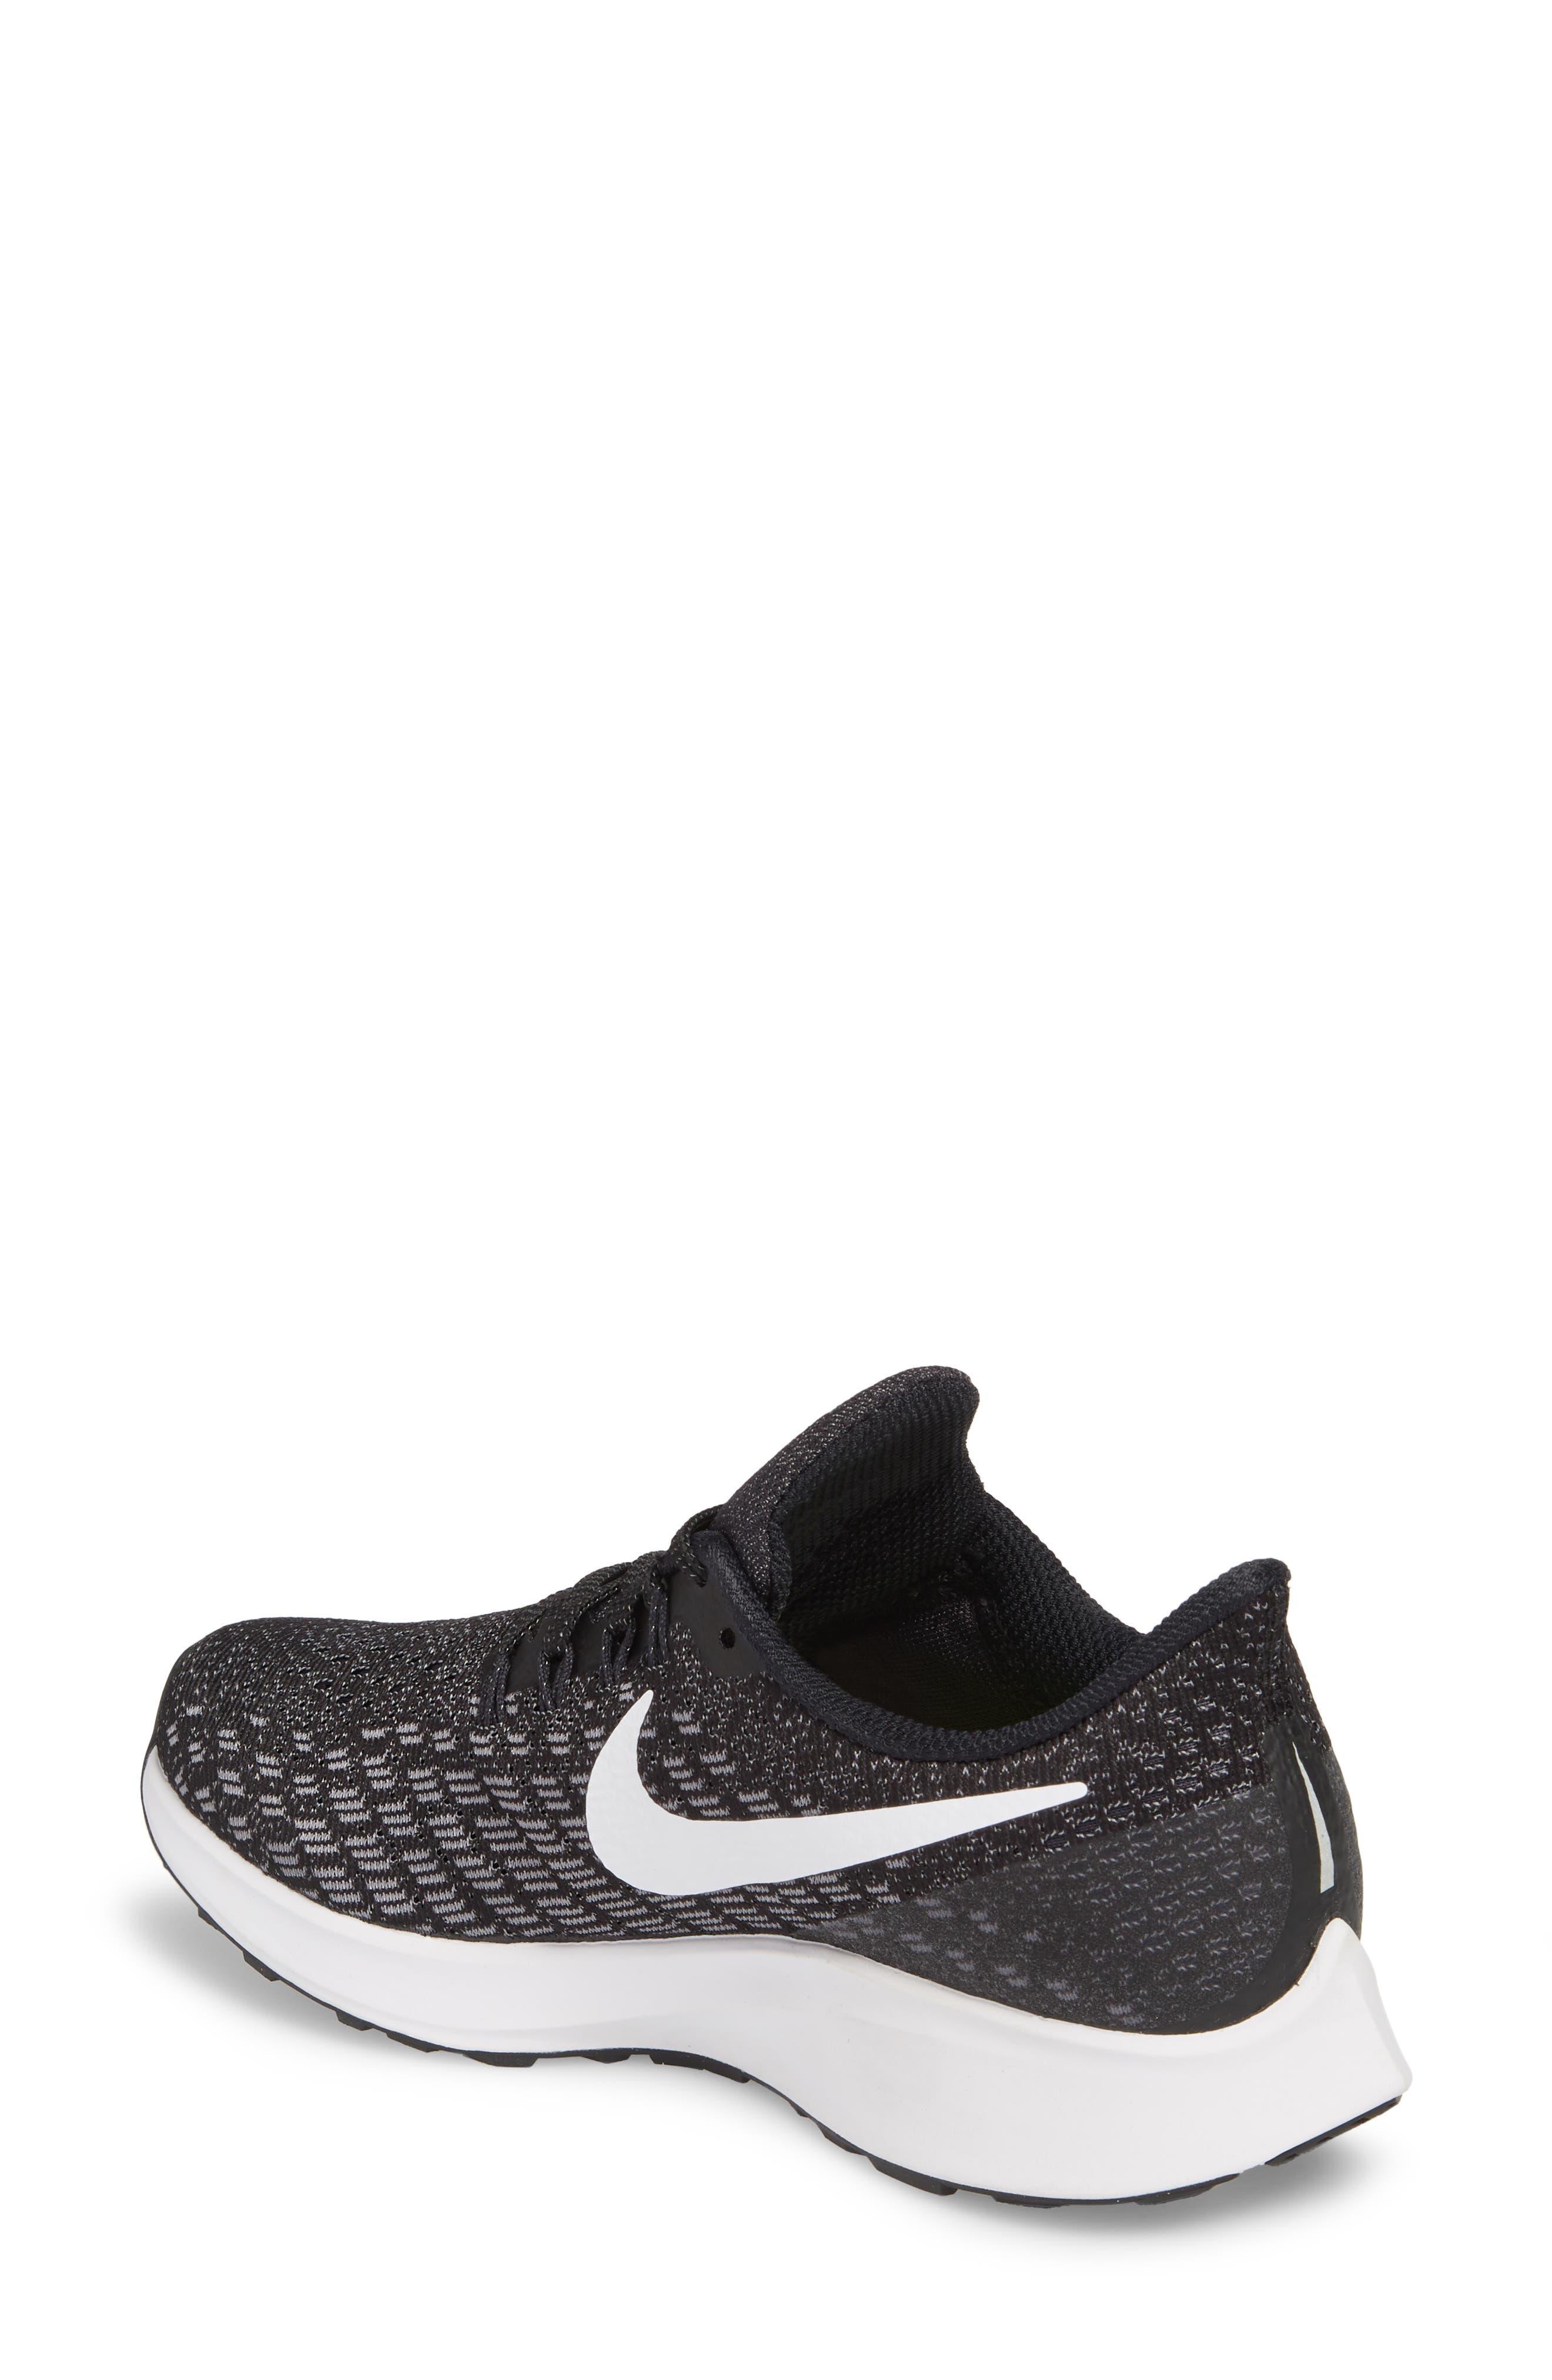 wholesale dealer 9de99 23248 Nike Women s Running Shoes and Sneakers   Nordstrom